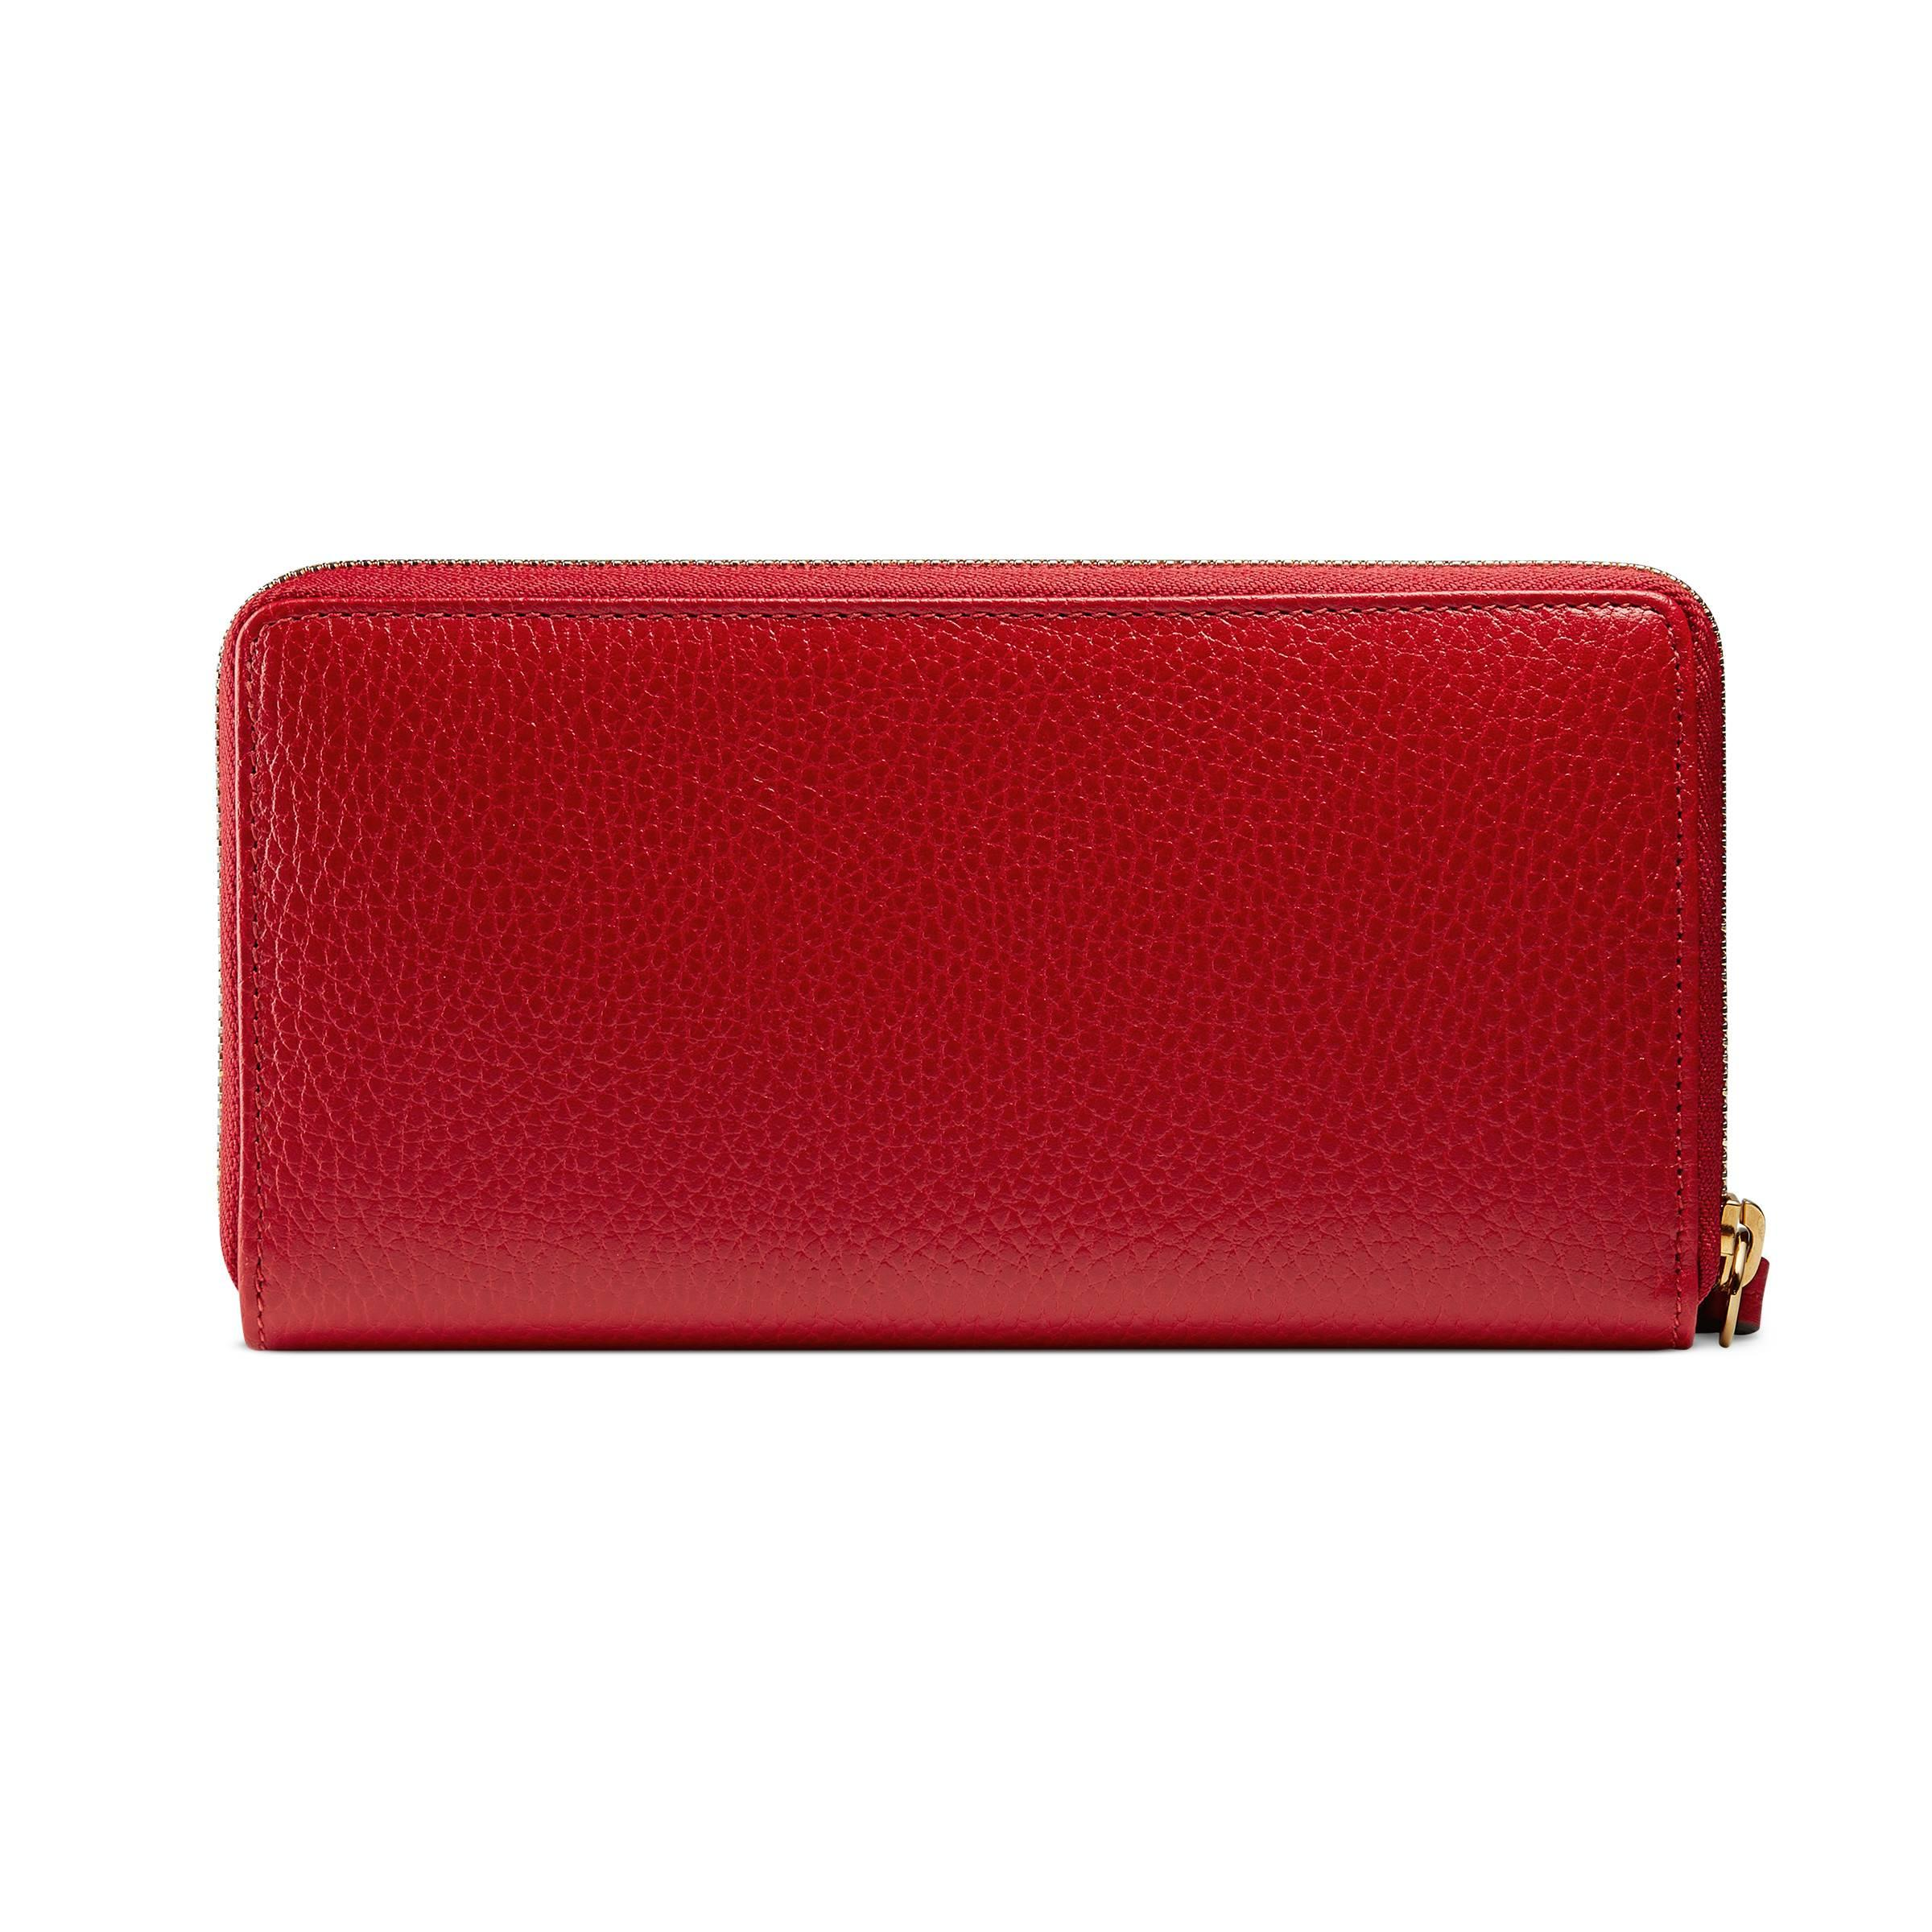 5d07053d59ca Gucci - Red Portafoglio - Lyst. View fullscreen